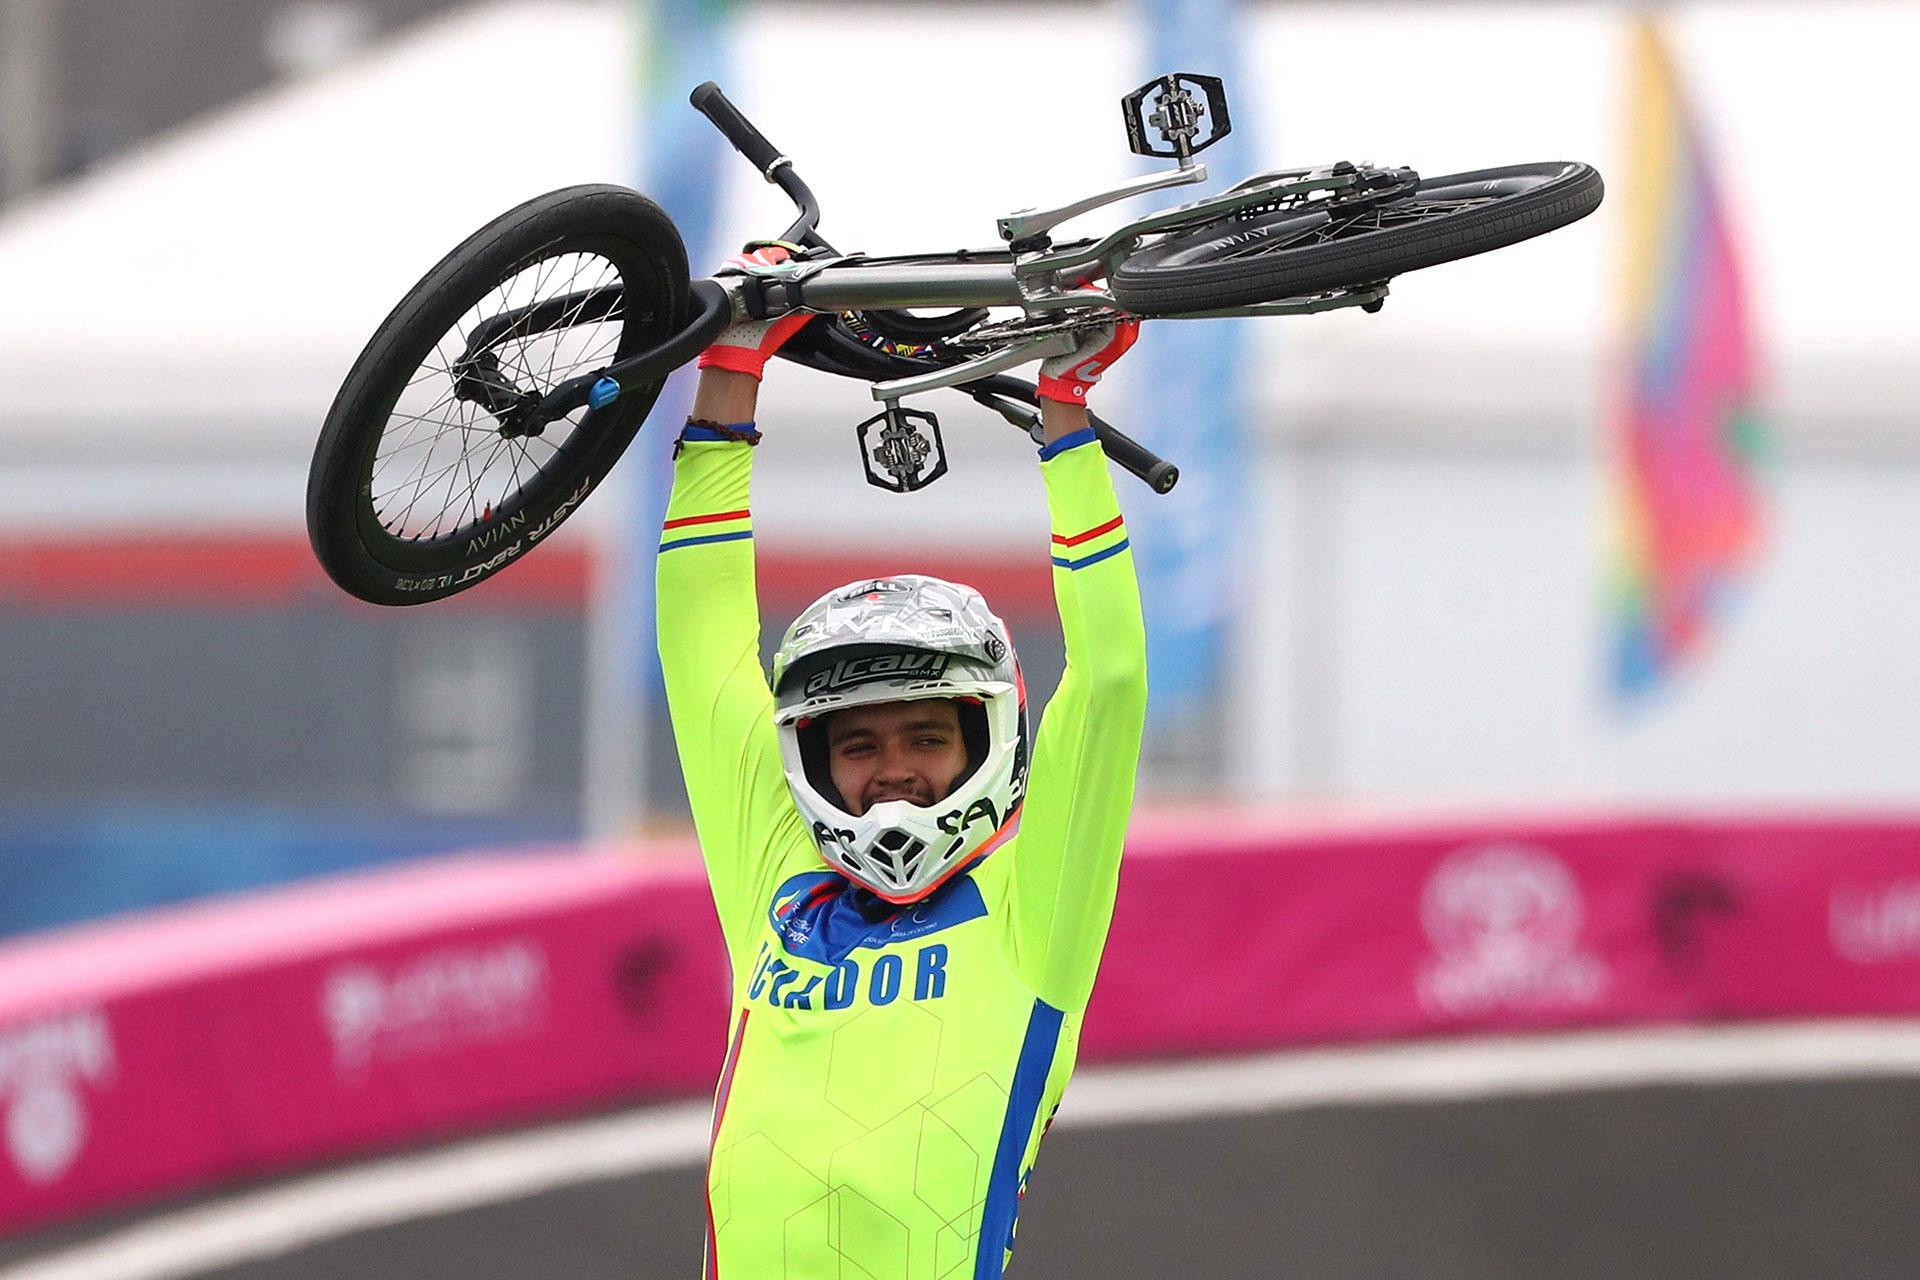 XVIII Pan American Games - Lima 2019 - Cycling BMX - Women Semifinal  - Costa Verde Beach Circuit, Lima, Peru - August 9, 2019. Gold medalist Ecuador's Alfredo Campo celebrates after the race. REUTERS/Pilar Olivares